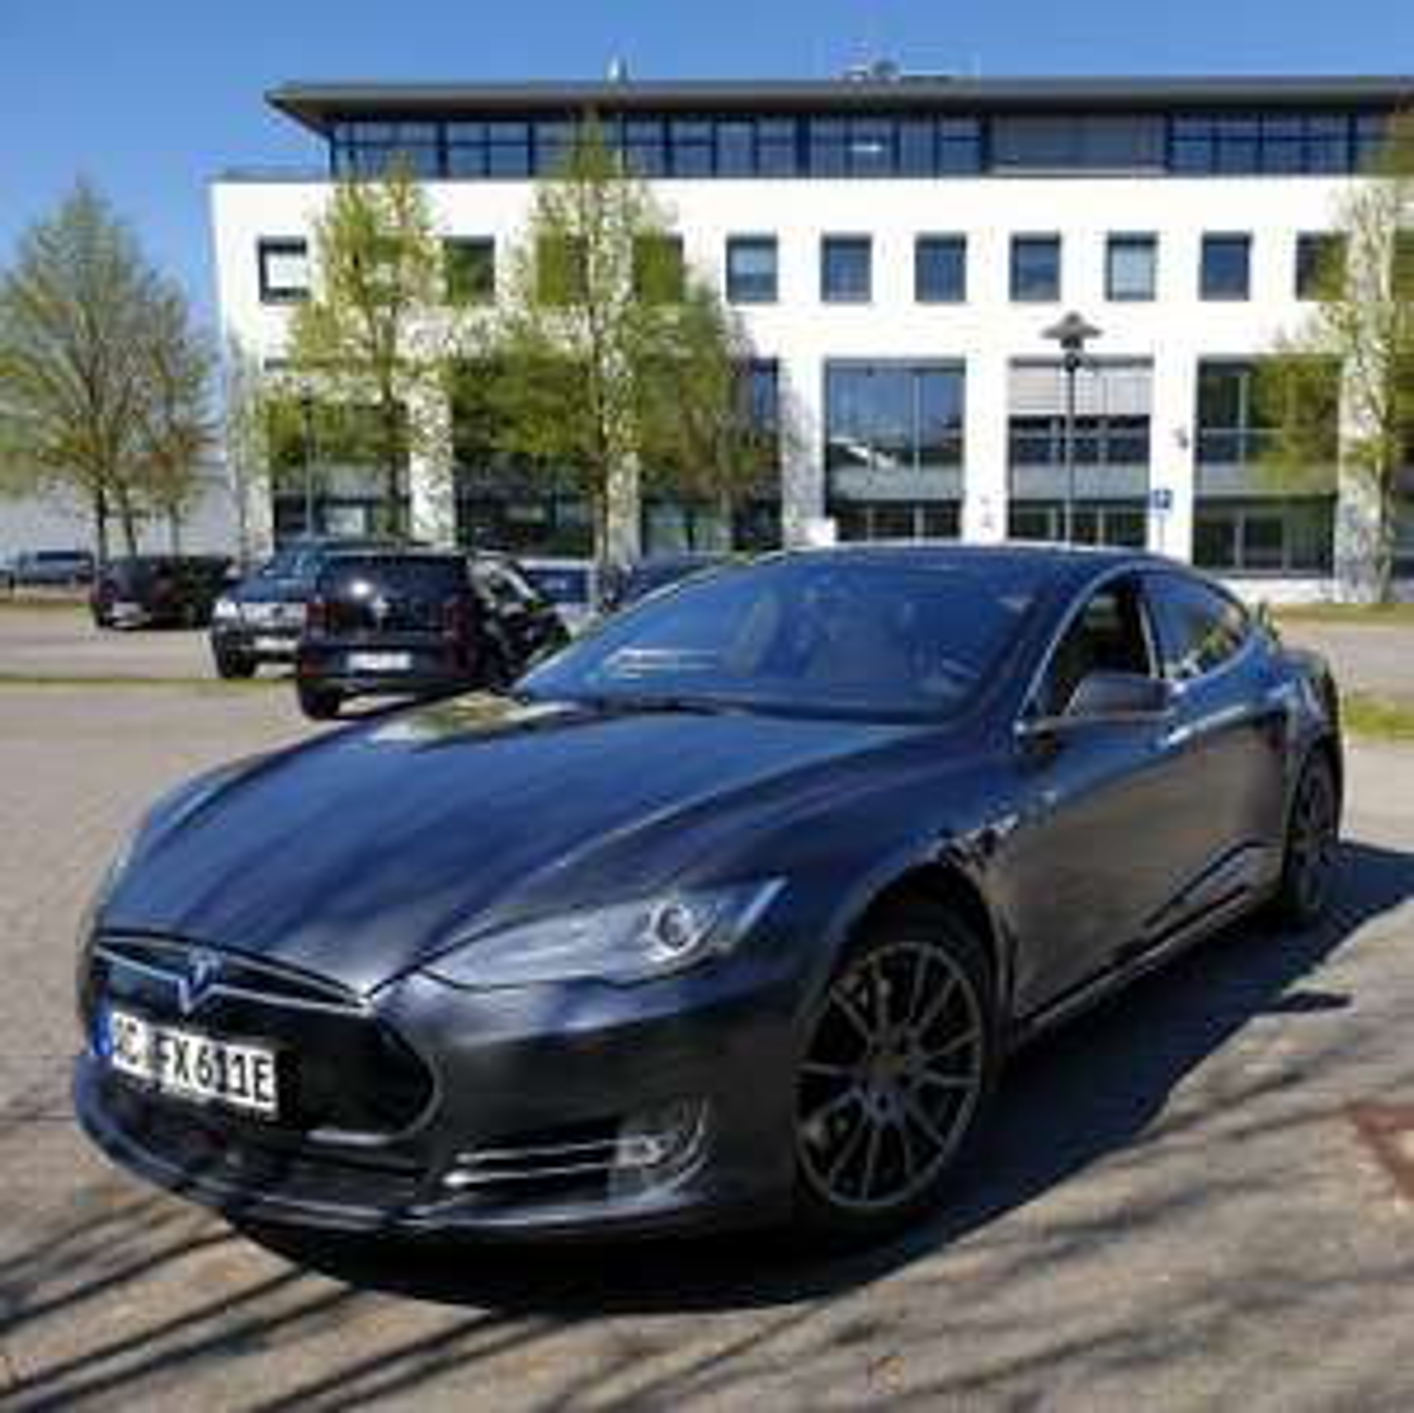 Tesla Model S mieten ab einem Tag - unbegrenzt Laden und Kilometer [Aachen/Bonn/Kempten]